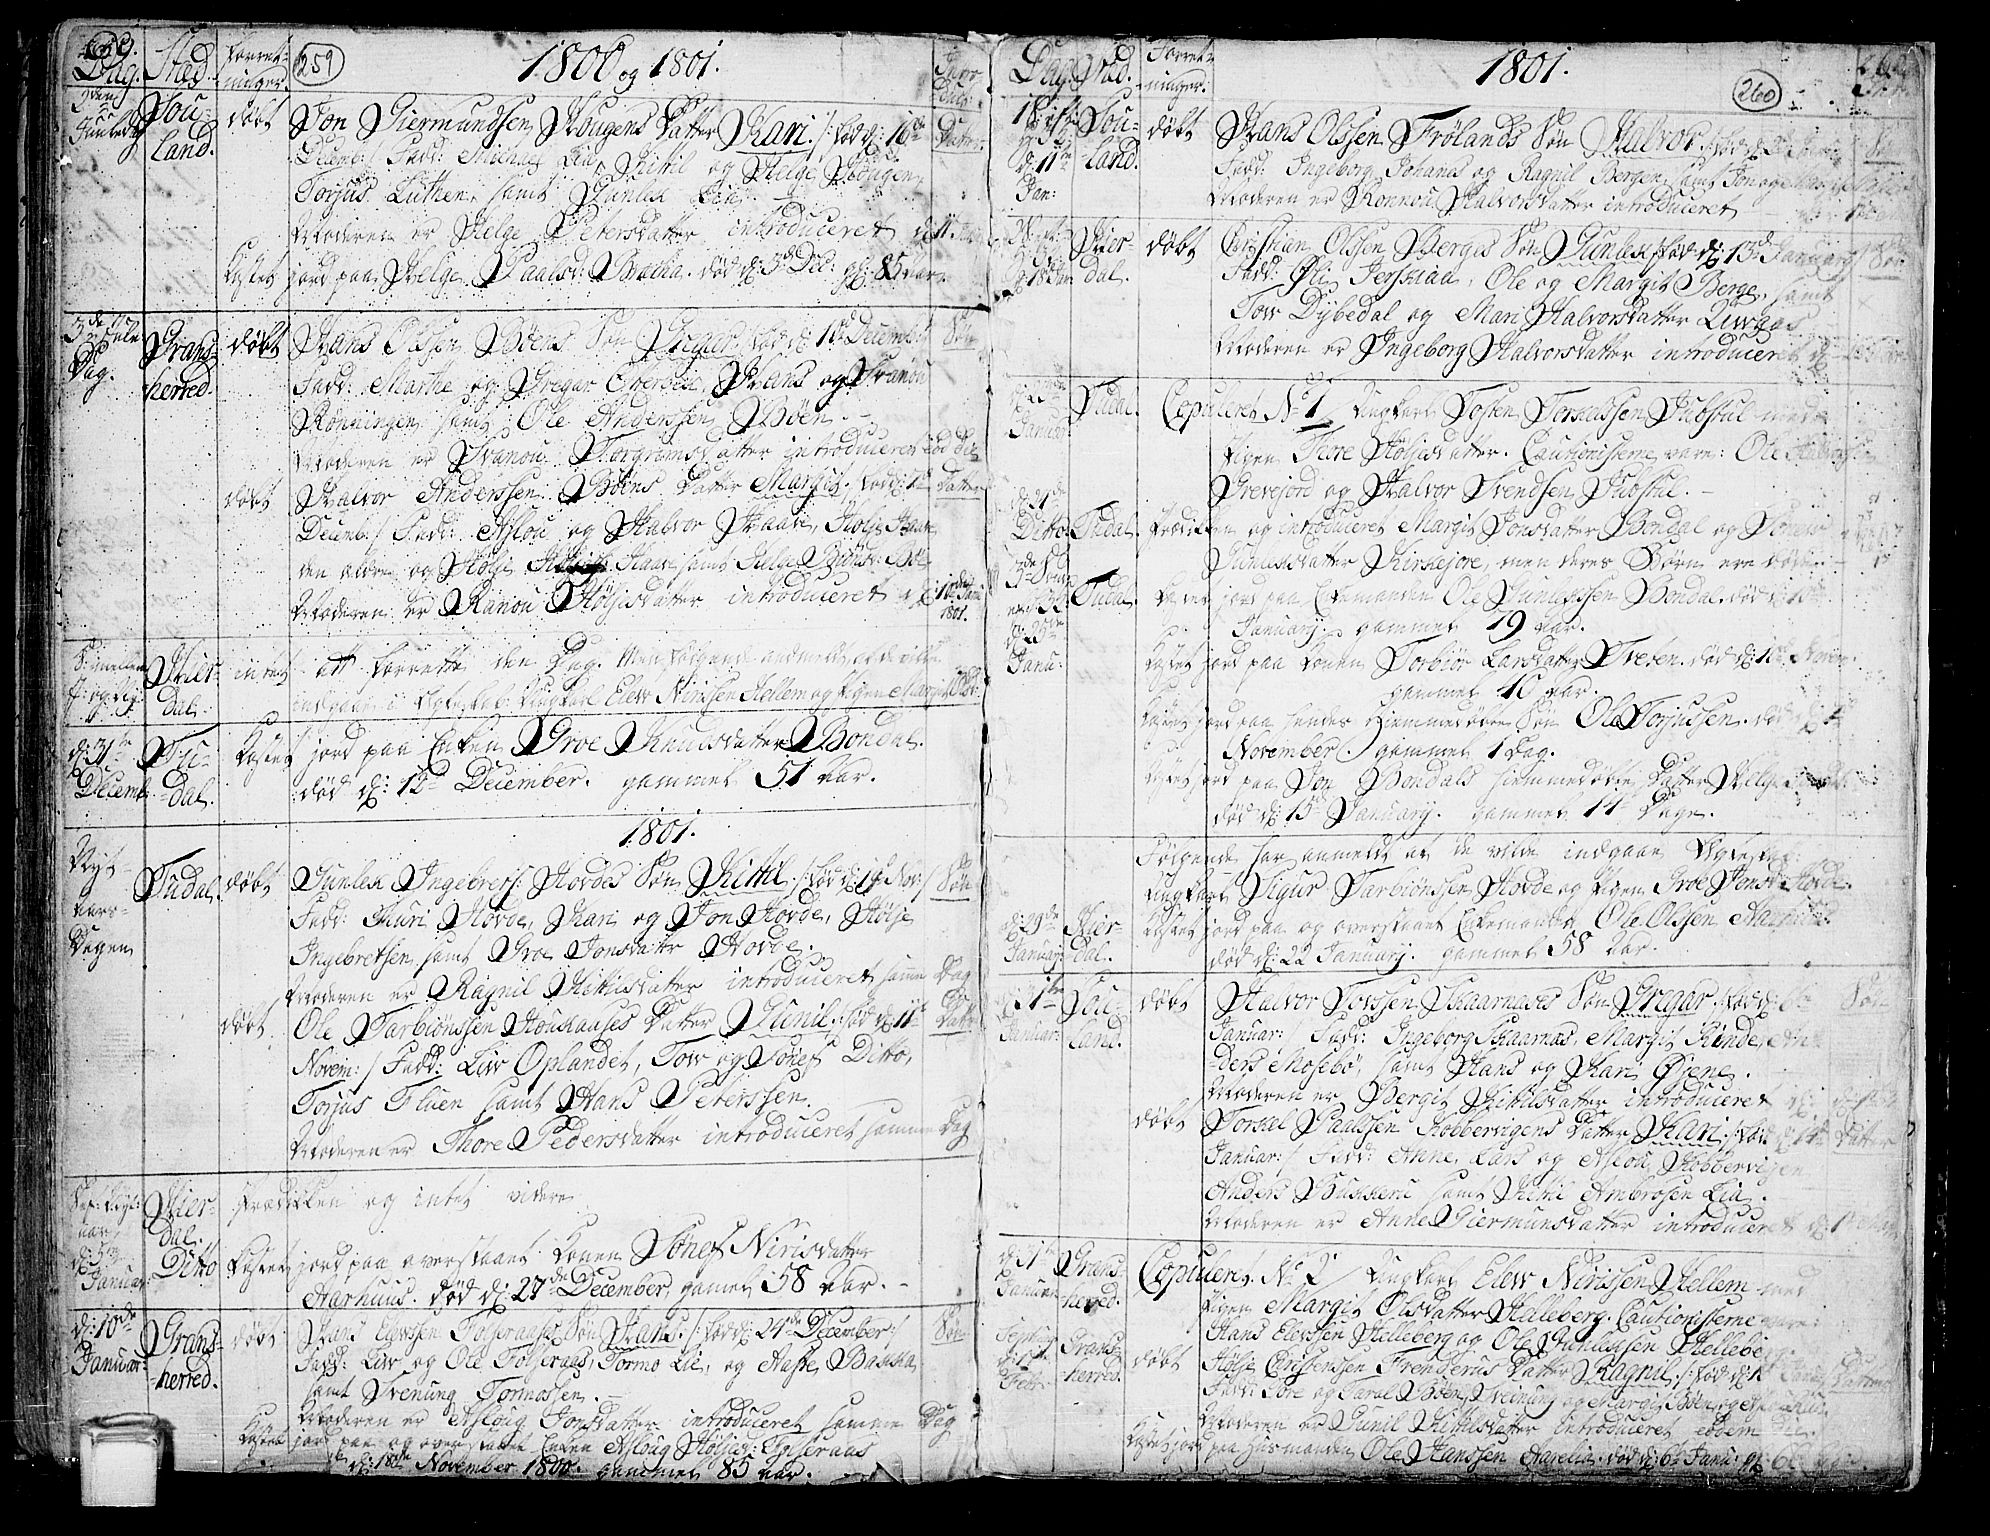 SAKO, Hjartdal kirkebøker, F/Fa/L0005: Ministerialbok nr. I 5, 1776-1801, s. 259-260